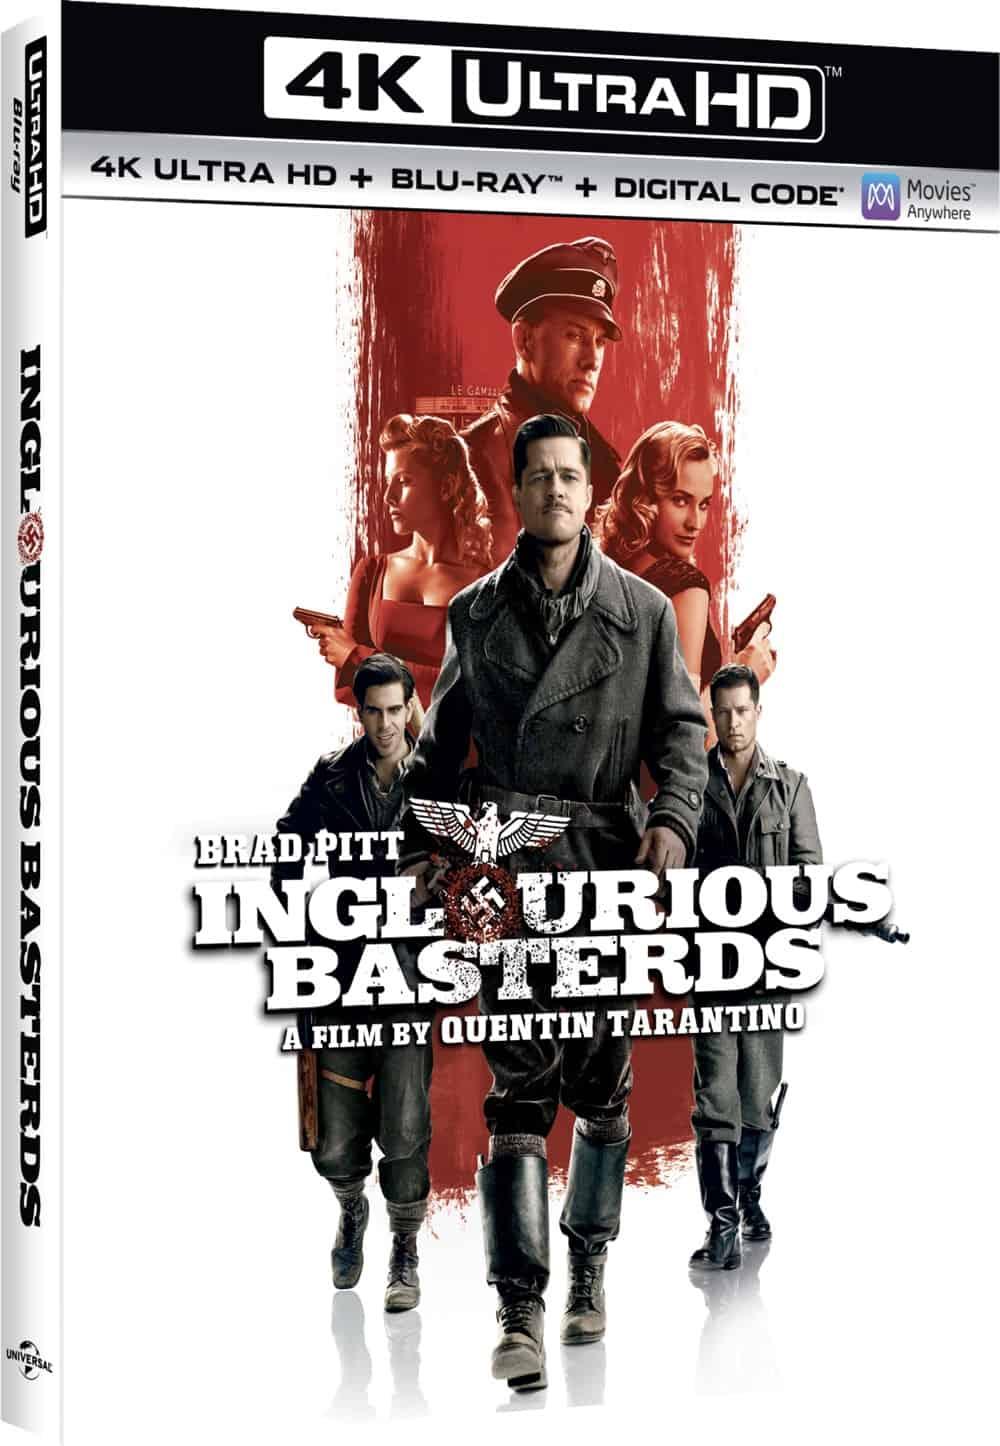 Inglourious Basterds 4K Box Cover Artwork